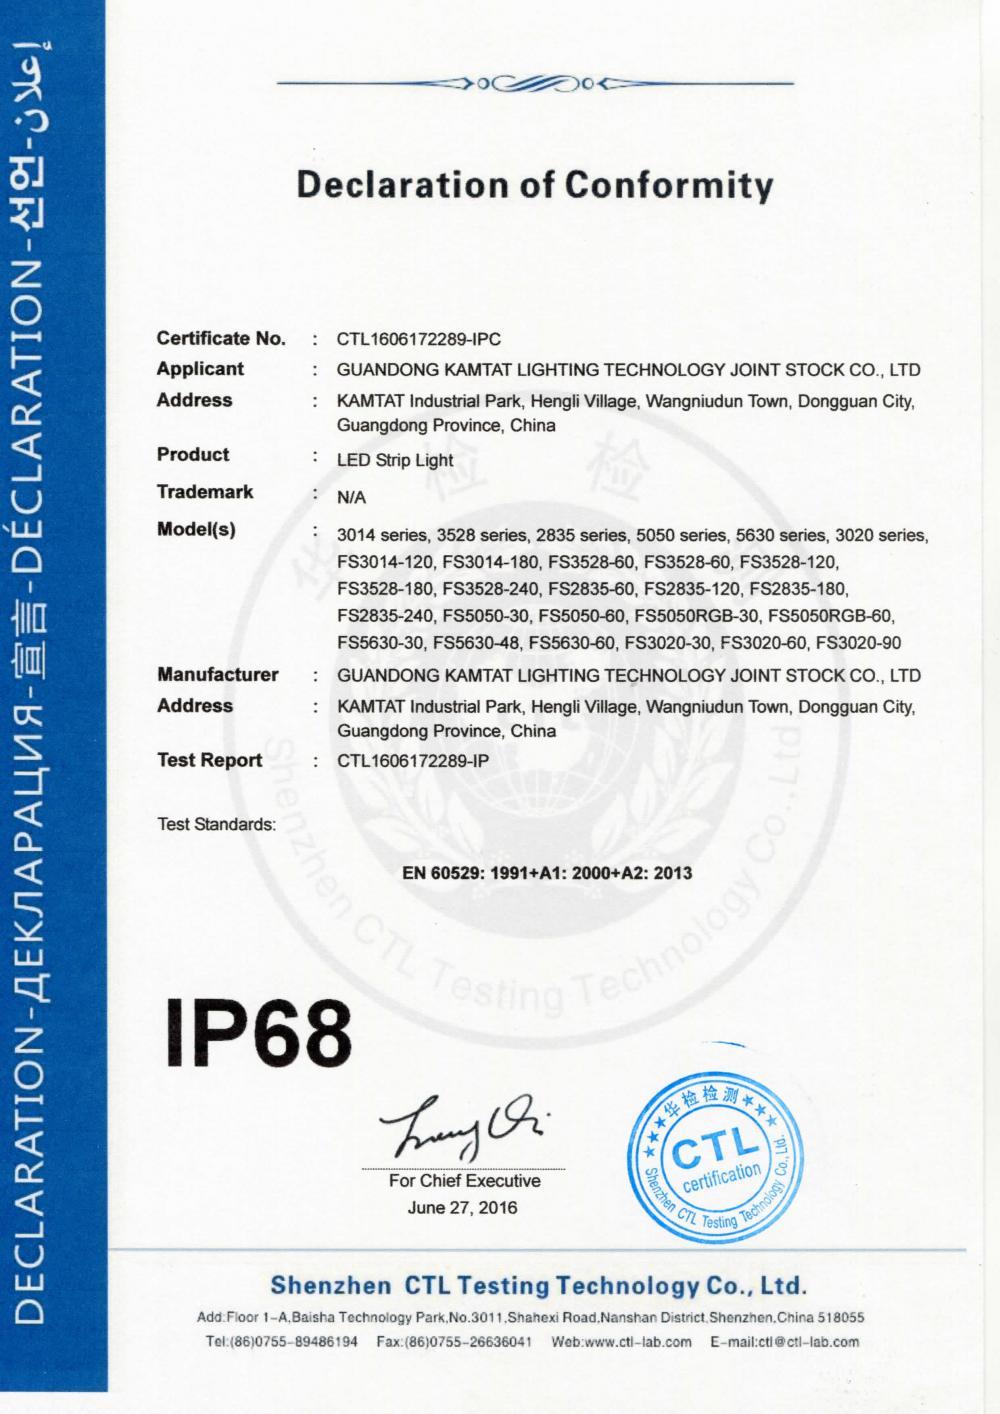 Certificates Guangdong Kamtat Lighting Technology Joint Stock Co